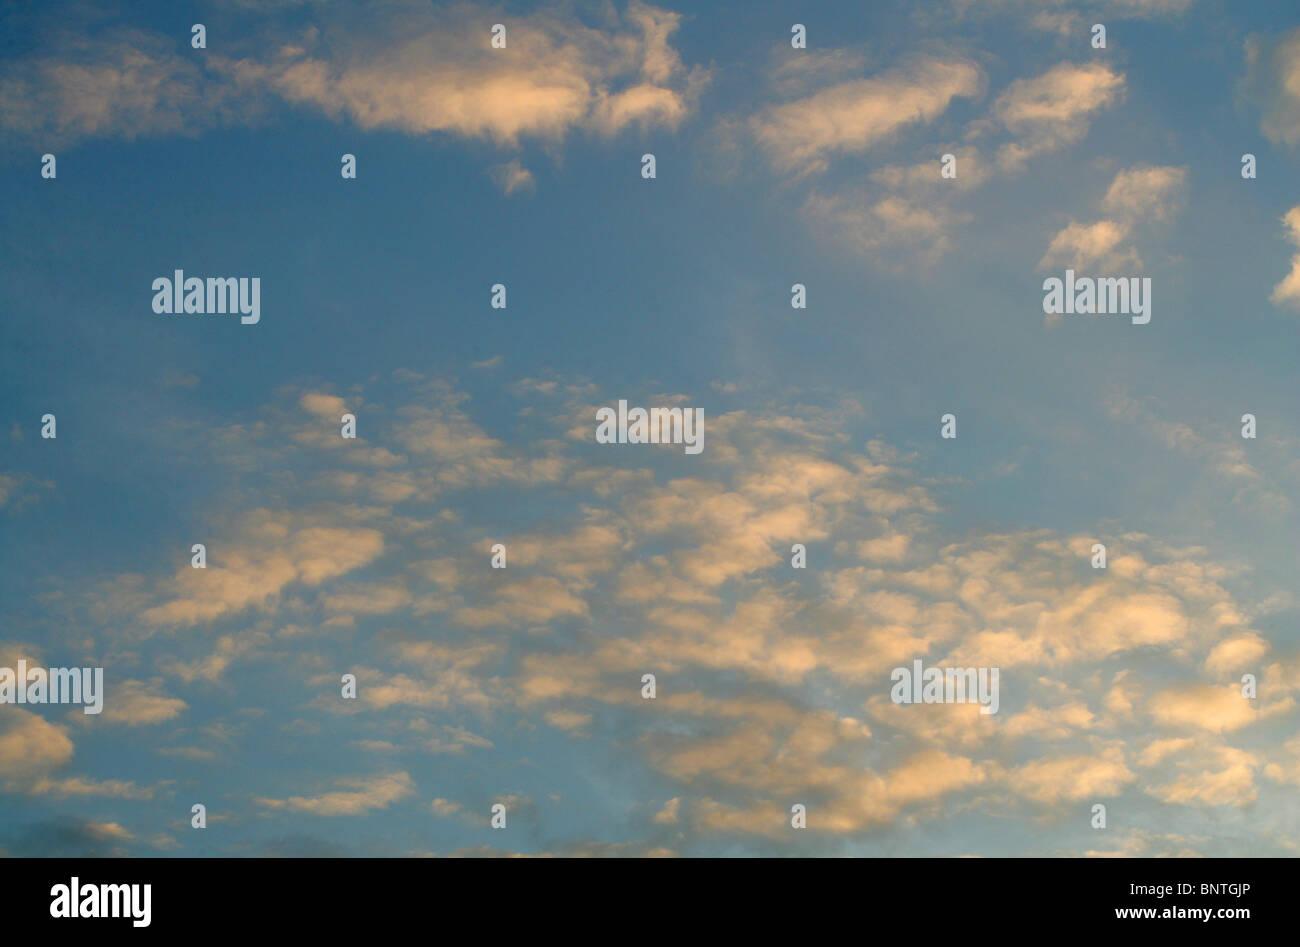 Fluffy White Cumulus Clouds in a Blue Sky - Stock Image